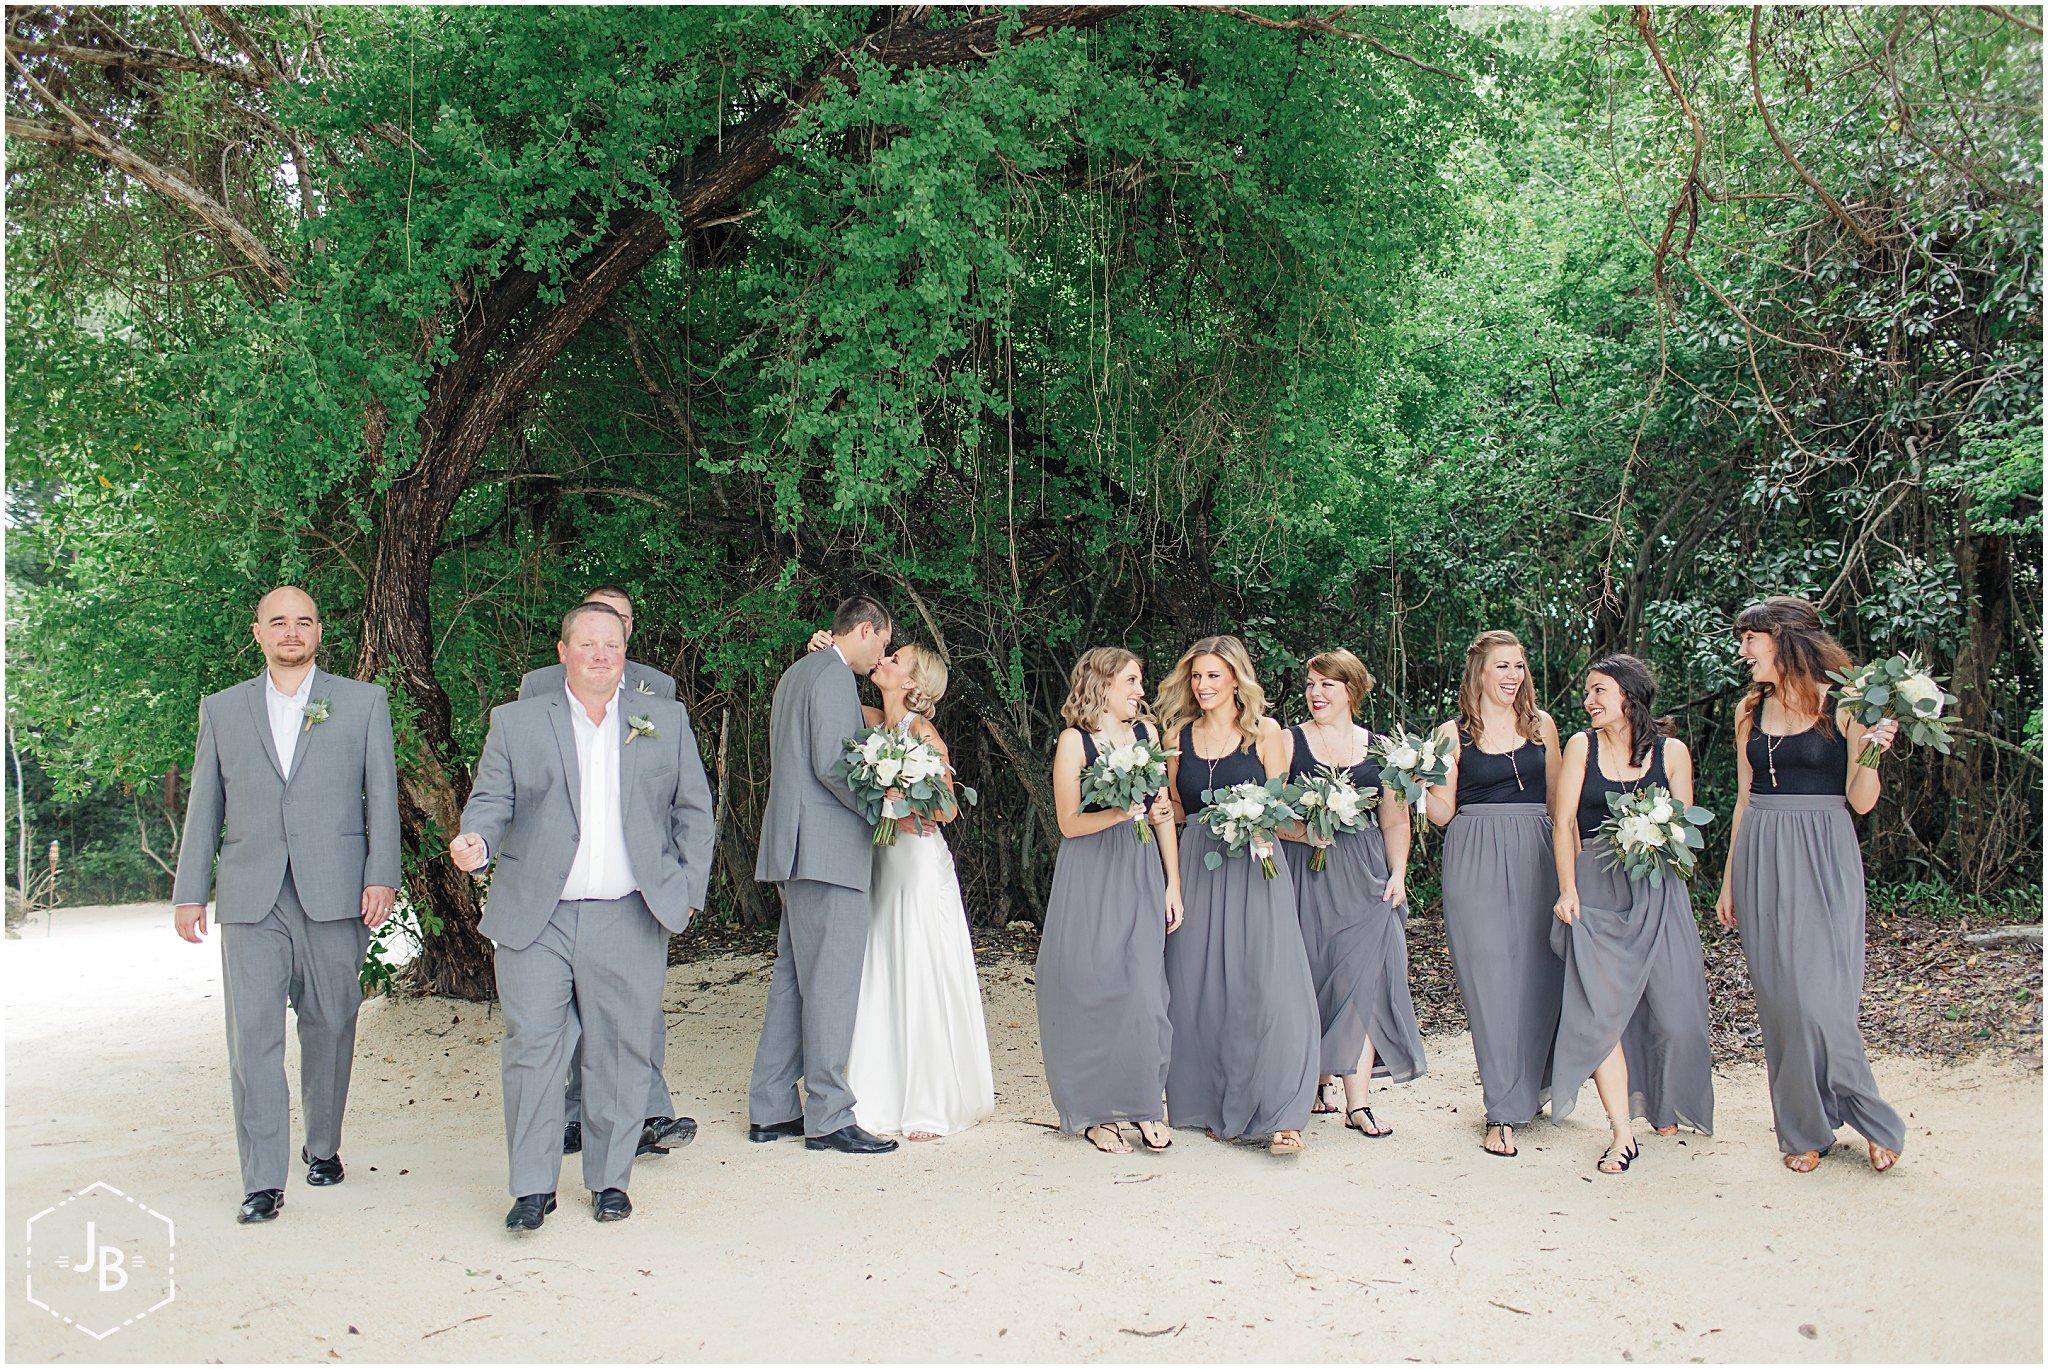 WeddingandEngagementFloridaPhotographer_1096.jpg